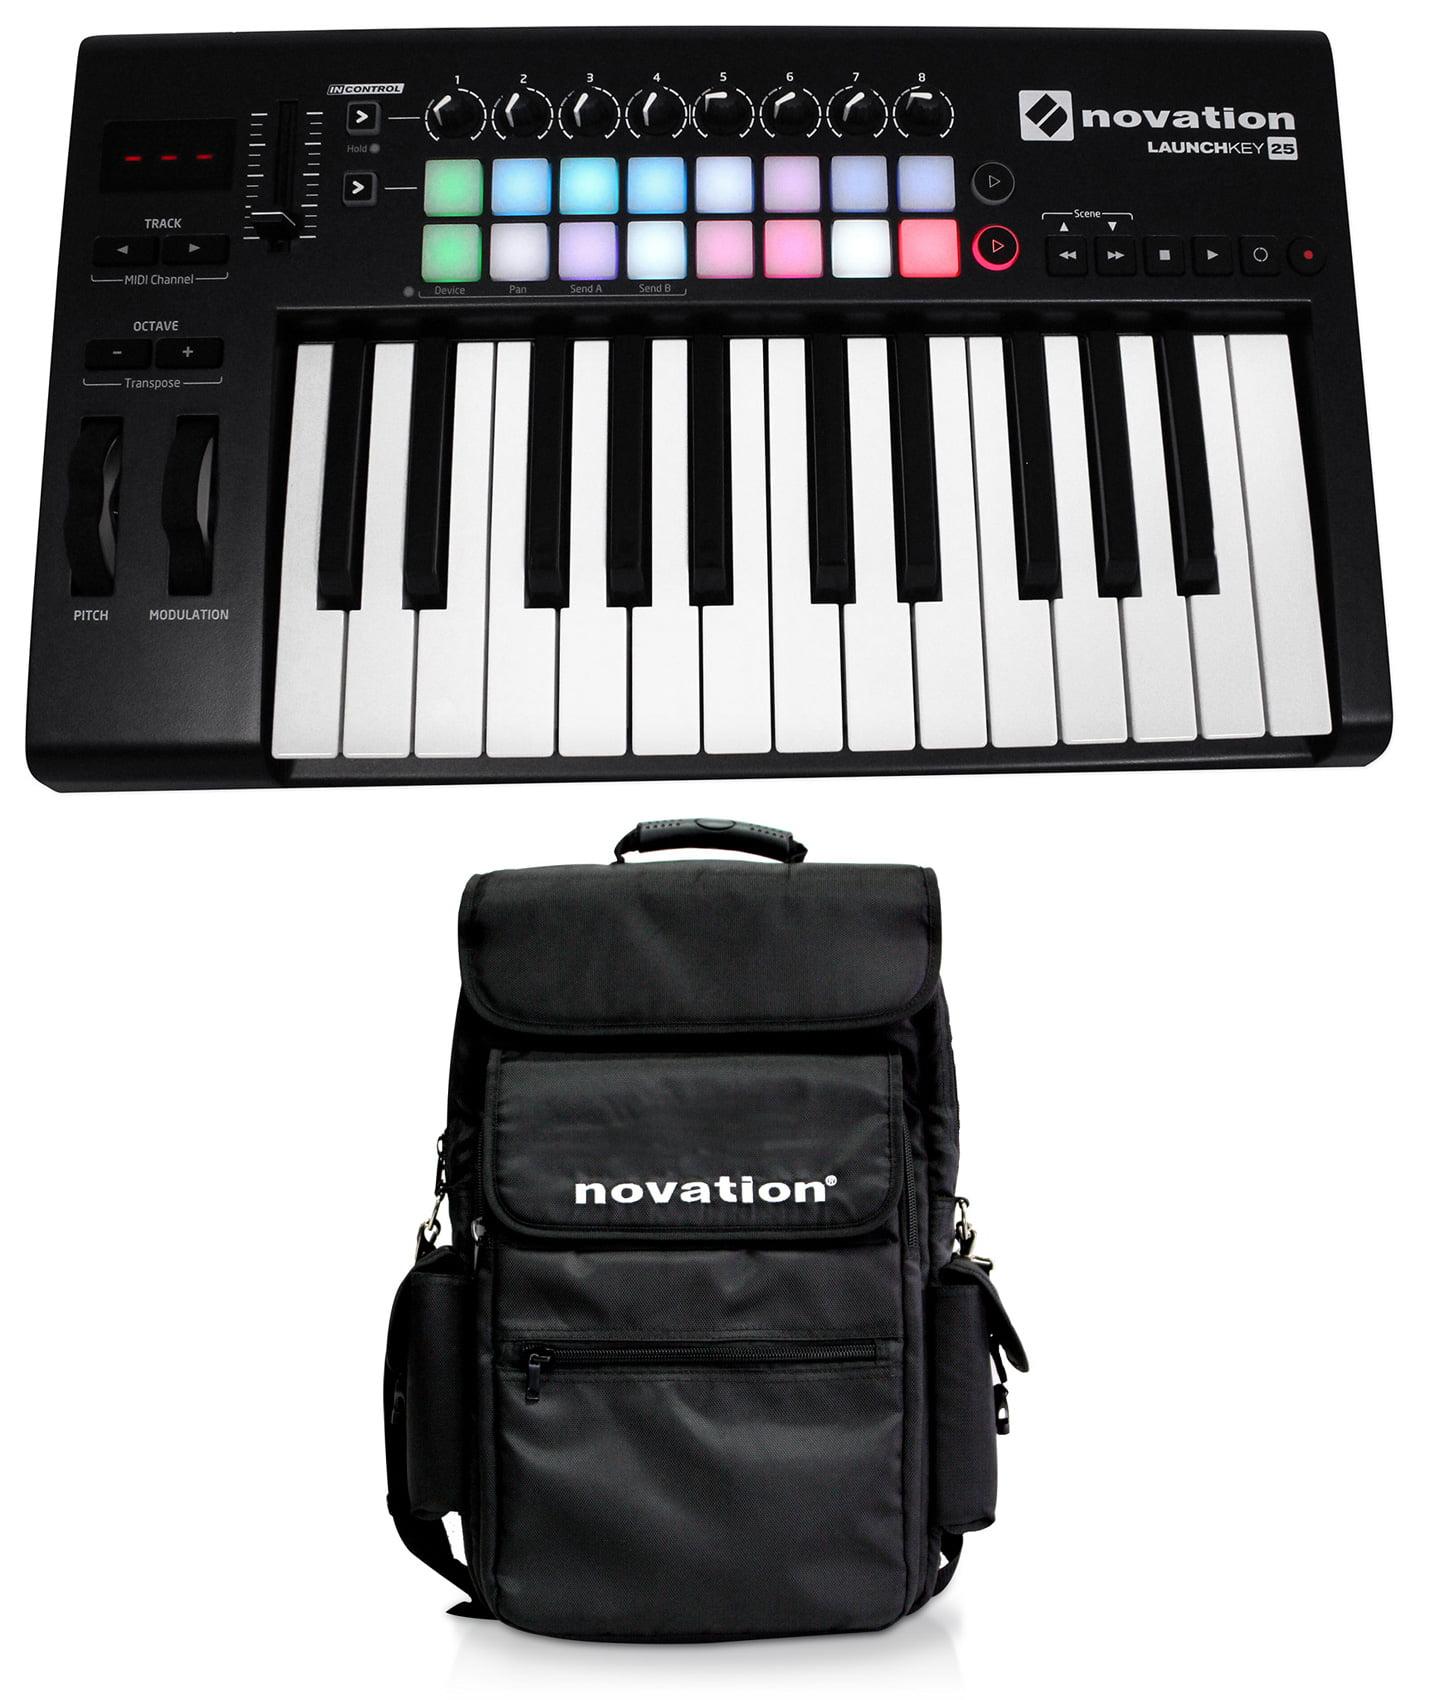 Novation LAUNCHKEY-25-MK2 25-Key USB MIDI Ableton Keyboard Controller+Carry Bag by NOVATION